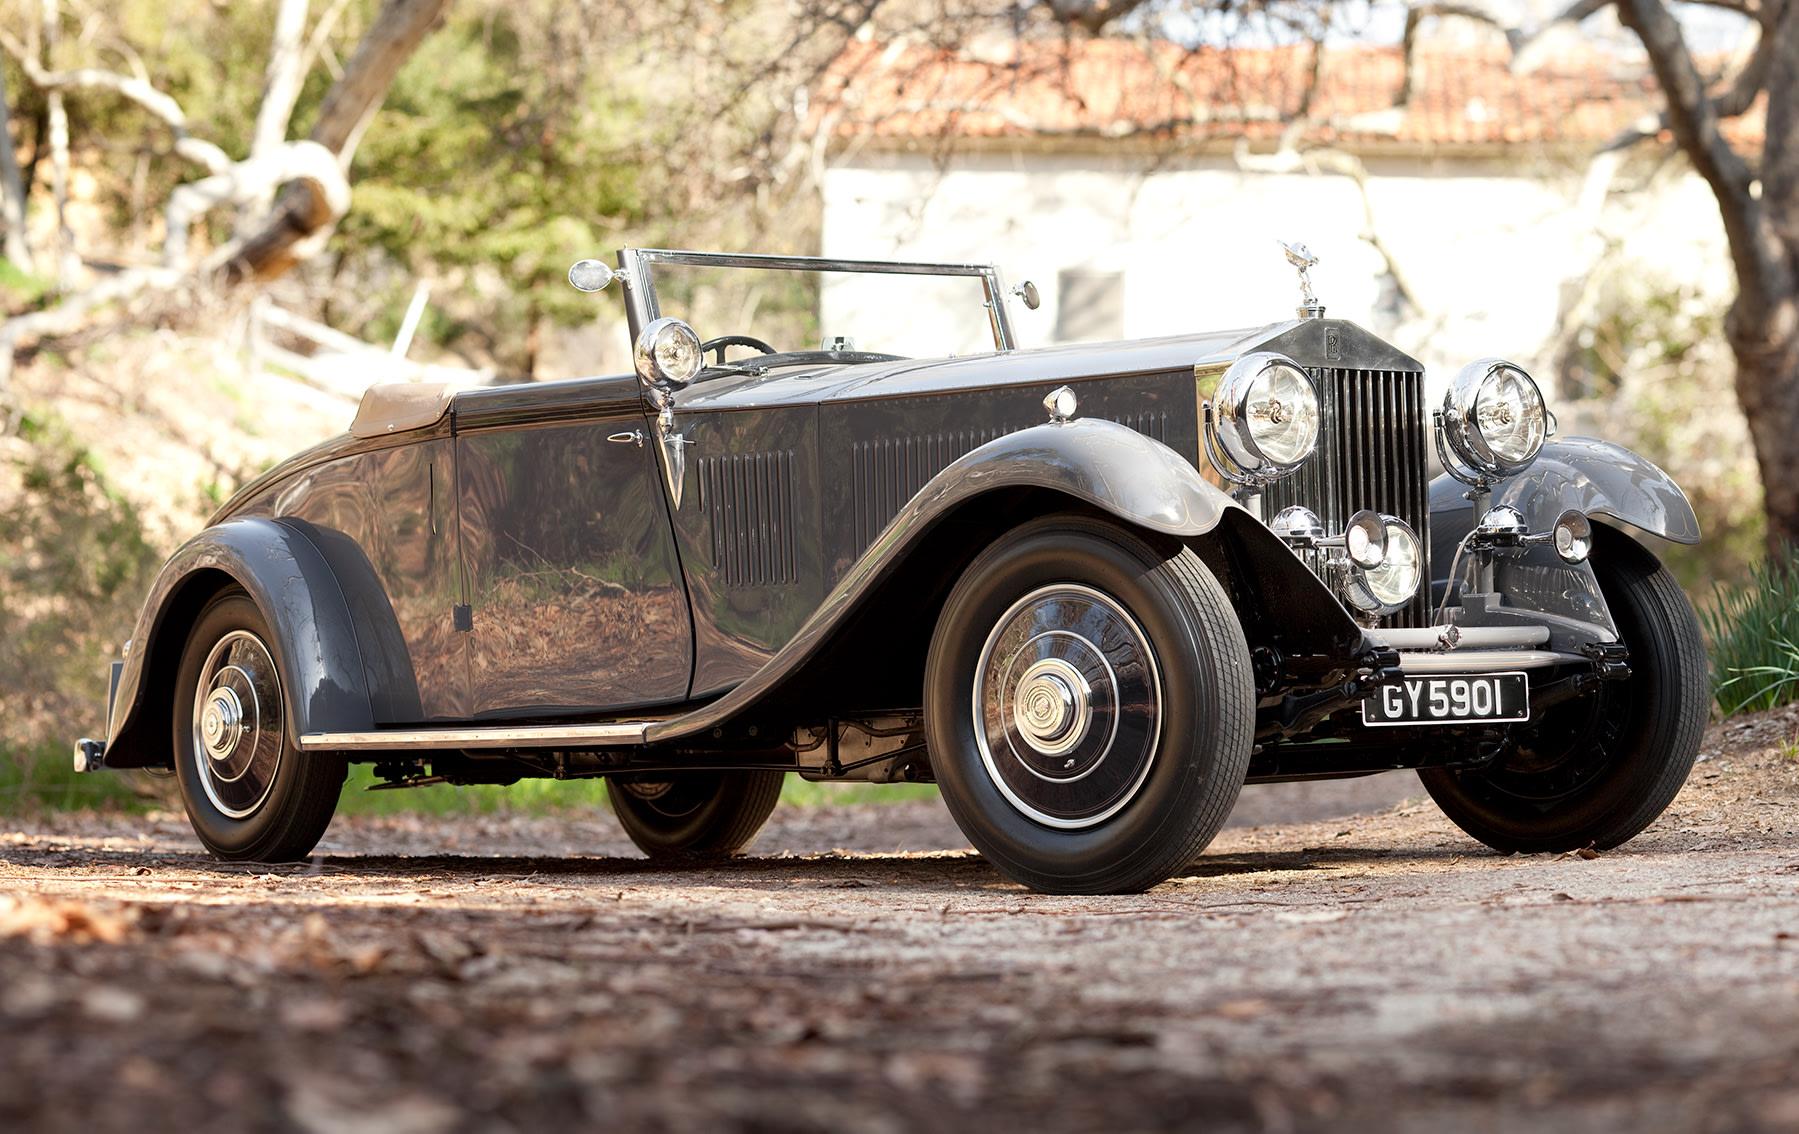 1932 Rolls-Royce Phantom II Continental Drop Head Coupe